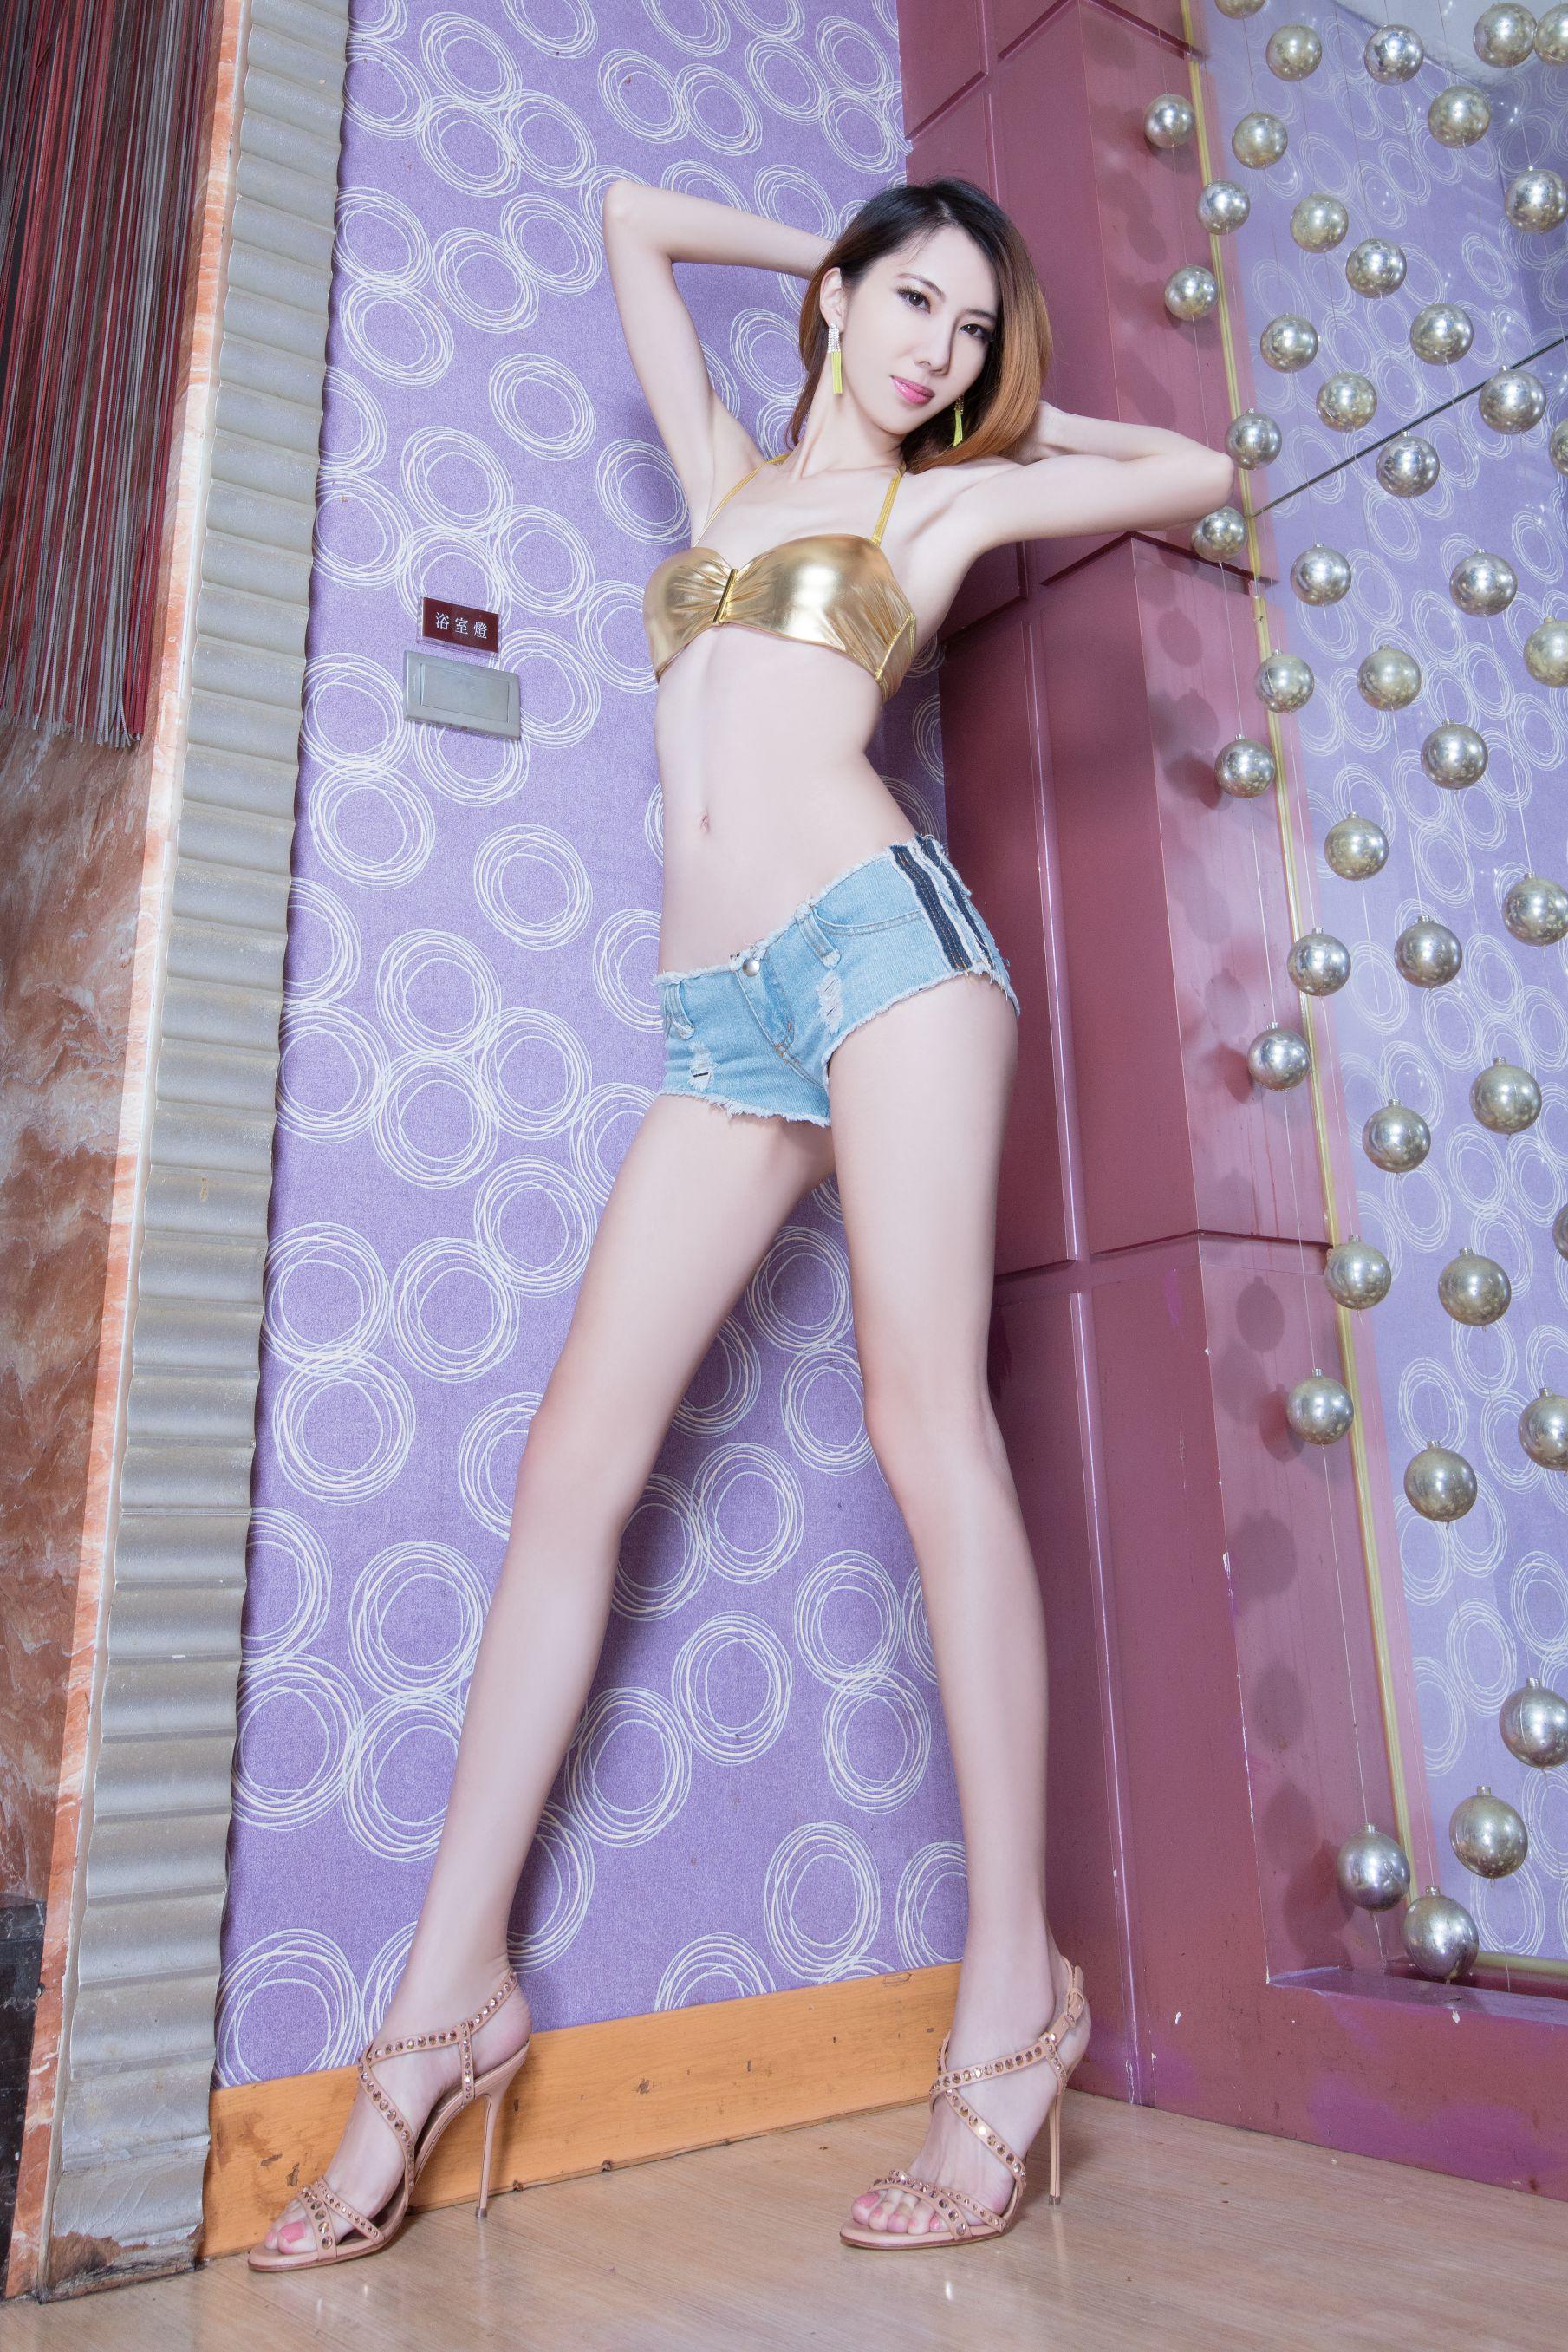 VOL.642 [Beautyleg]美腿吊带丝袜D罩杯美女:童采萱(Beautyleg Yoyo,腿模Yoyo)高品质写真套图(50P)